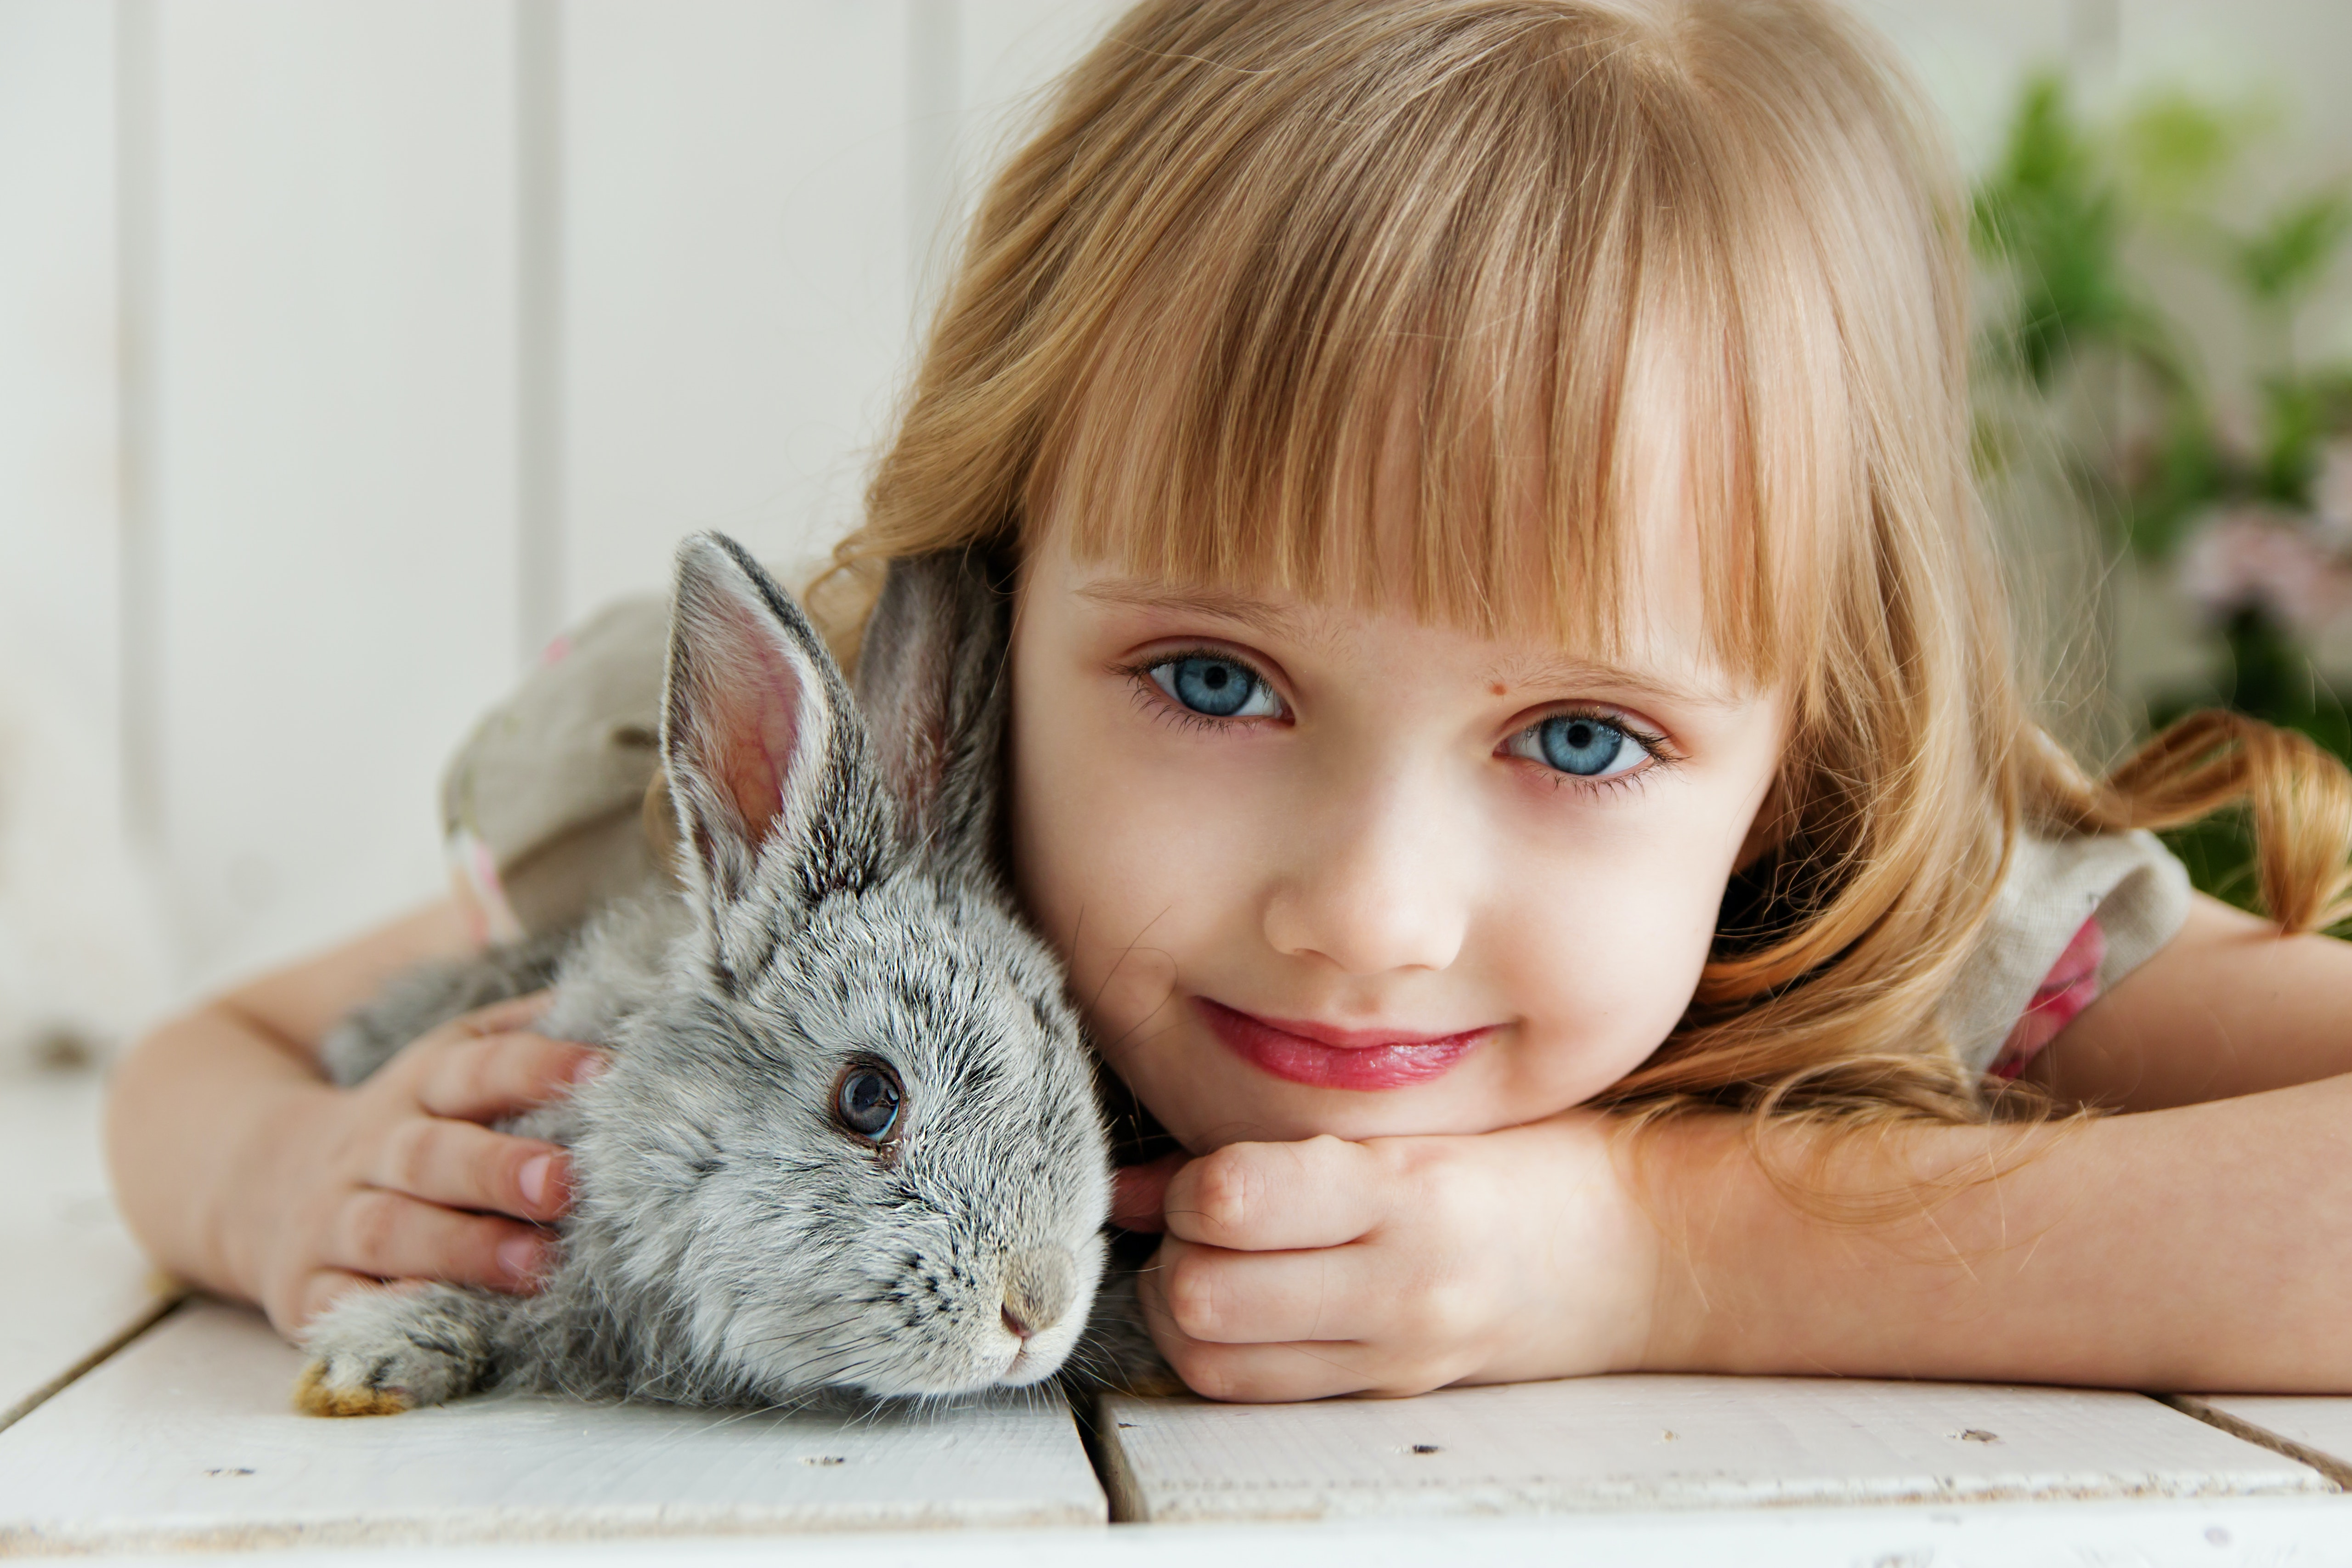 c334301cdc1 Girl Lying on White Surface Petting Gray Rabbit. Anastasiya Gepp